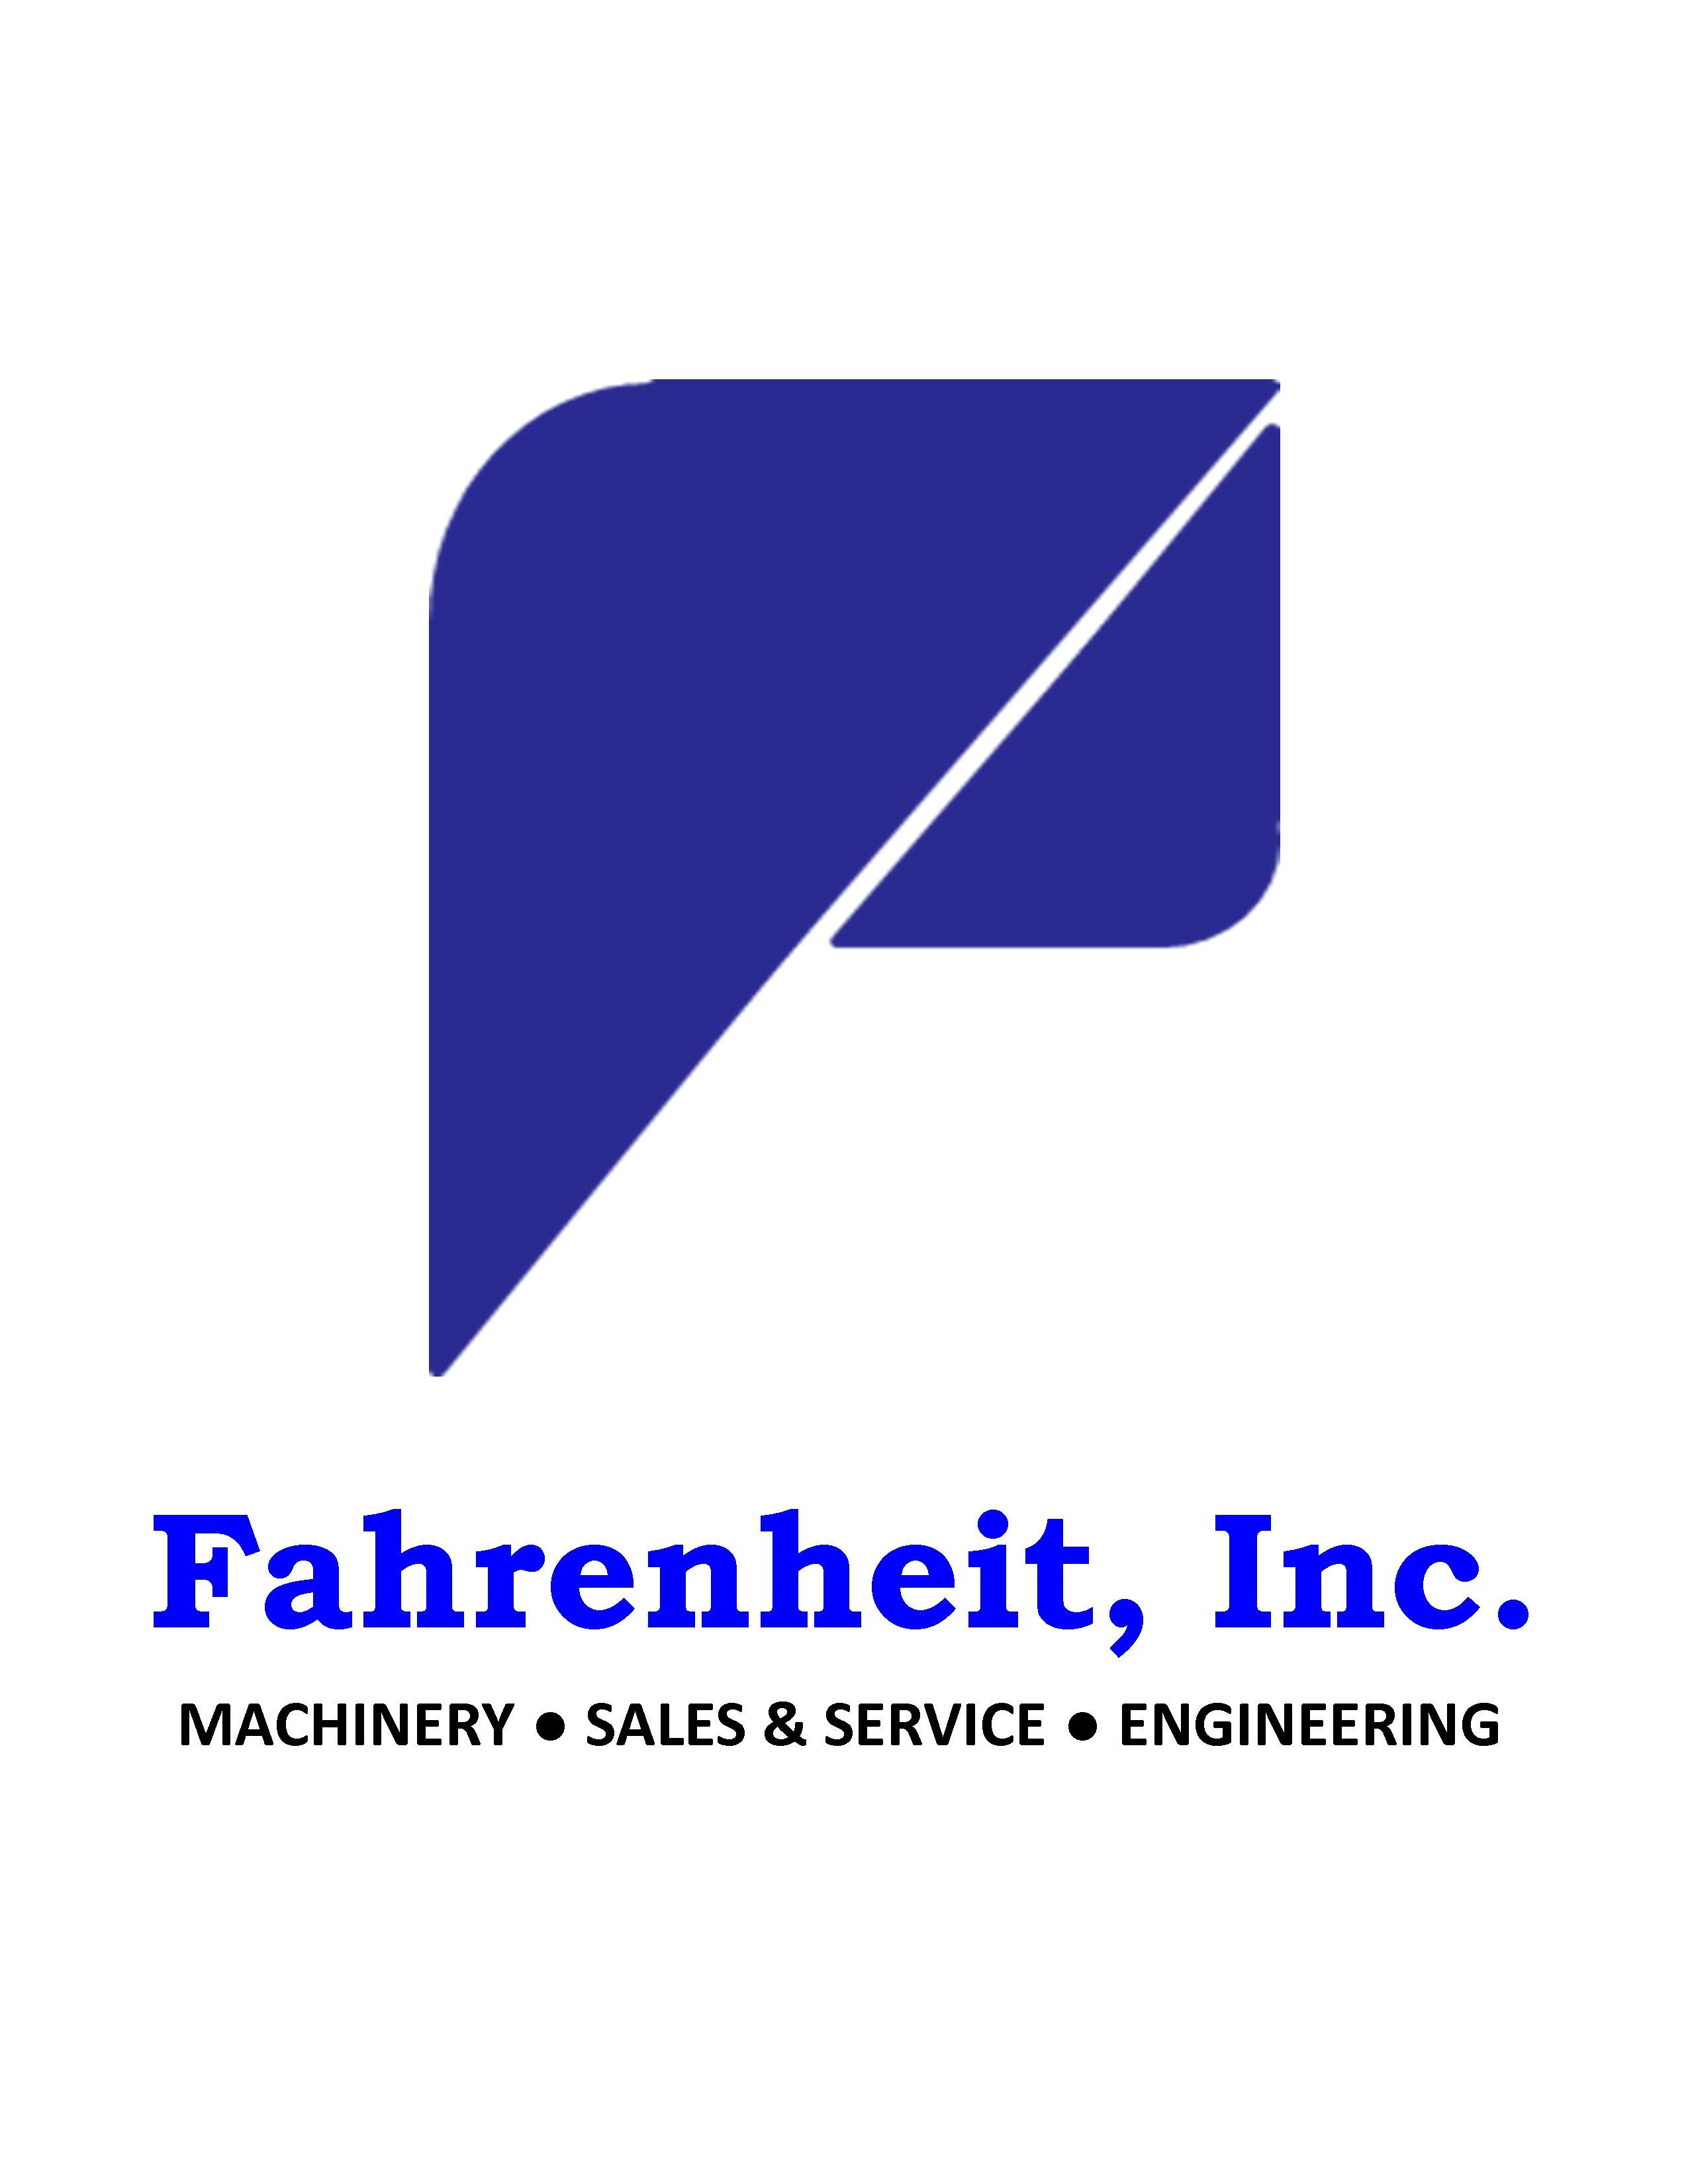 Fahrenheit Inc